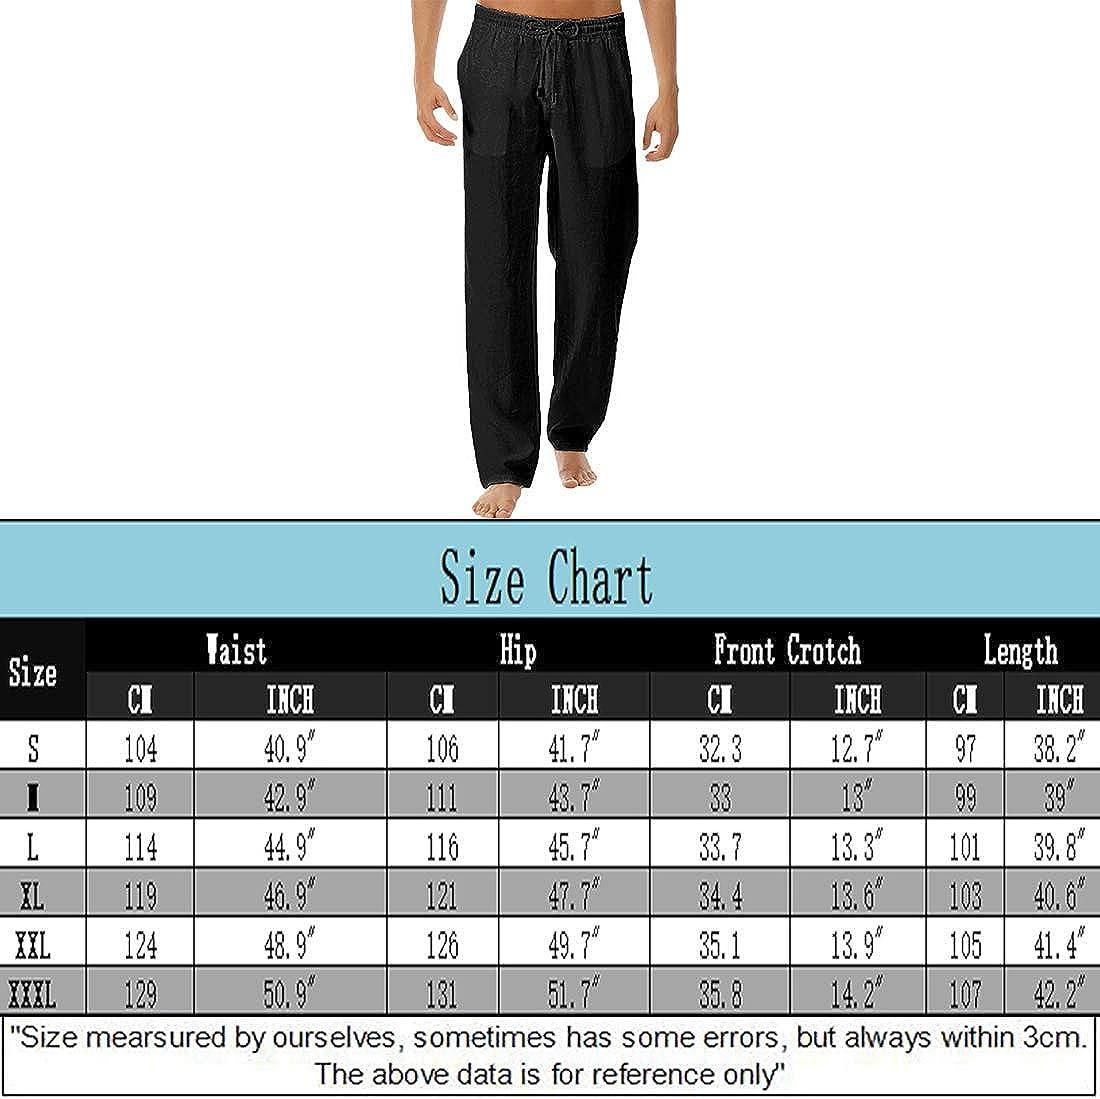 WZIKAI Man's Causal Linen Pants Lightweight Cotton Summer Trousers Elastic Waist Drawstring Lounging Pant